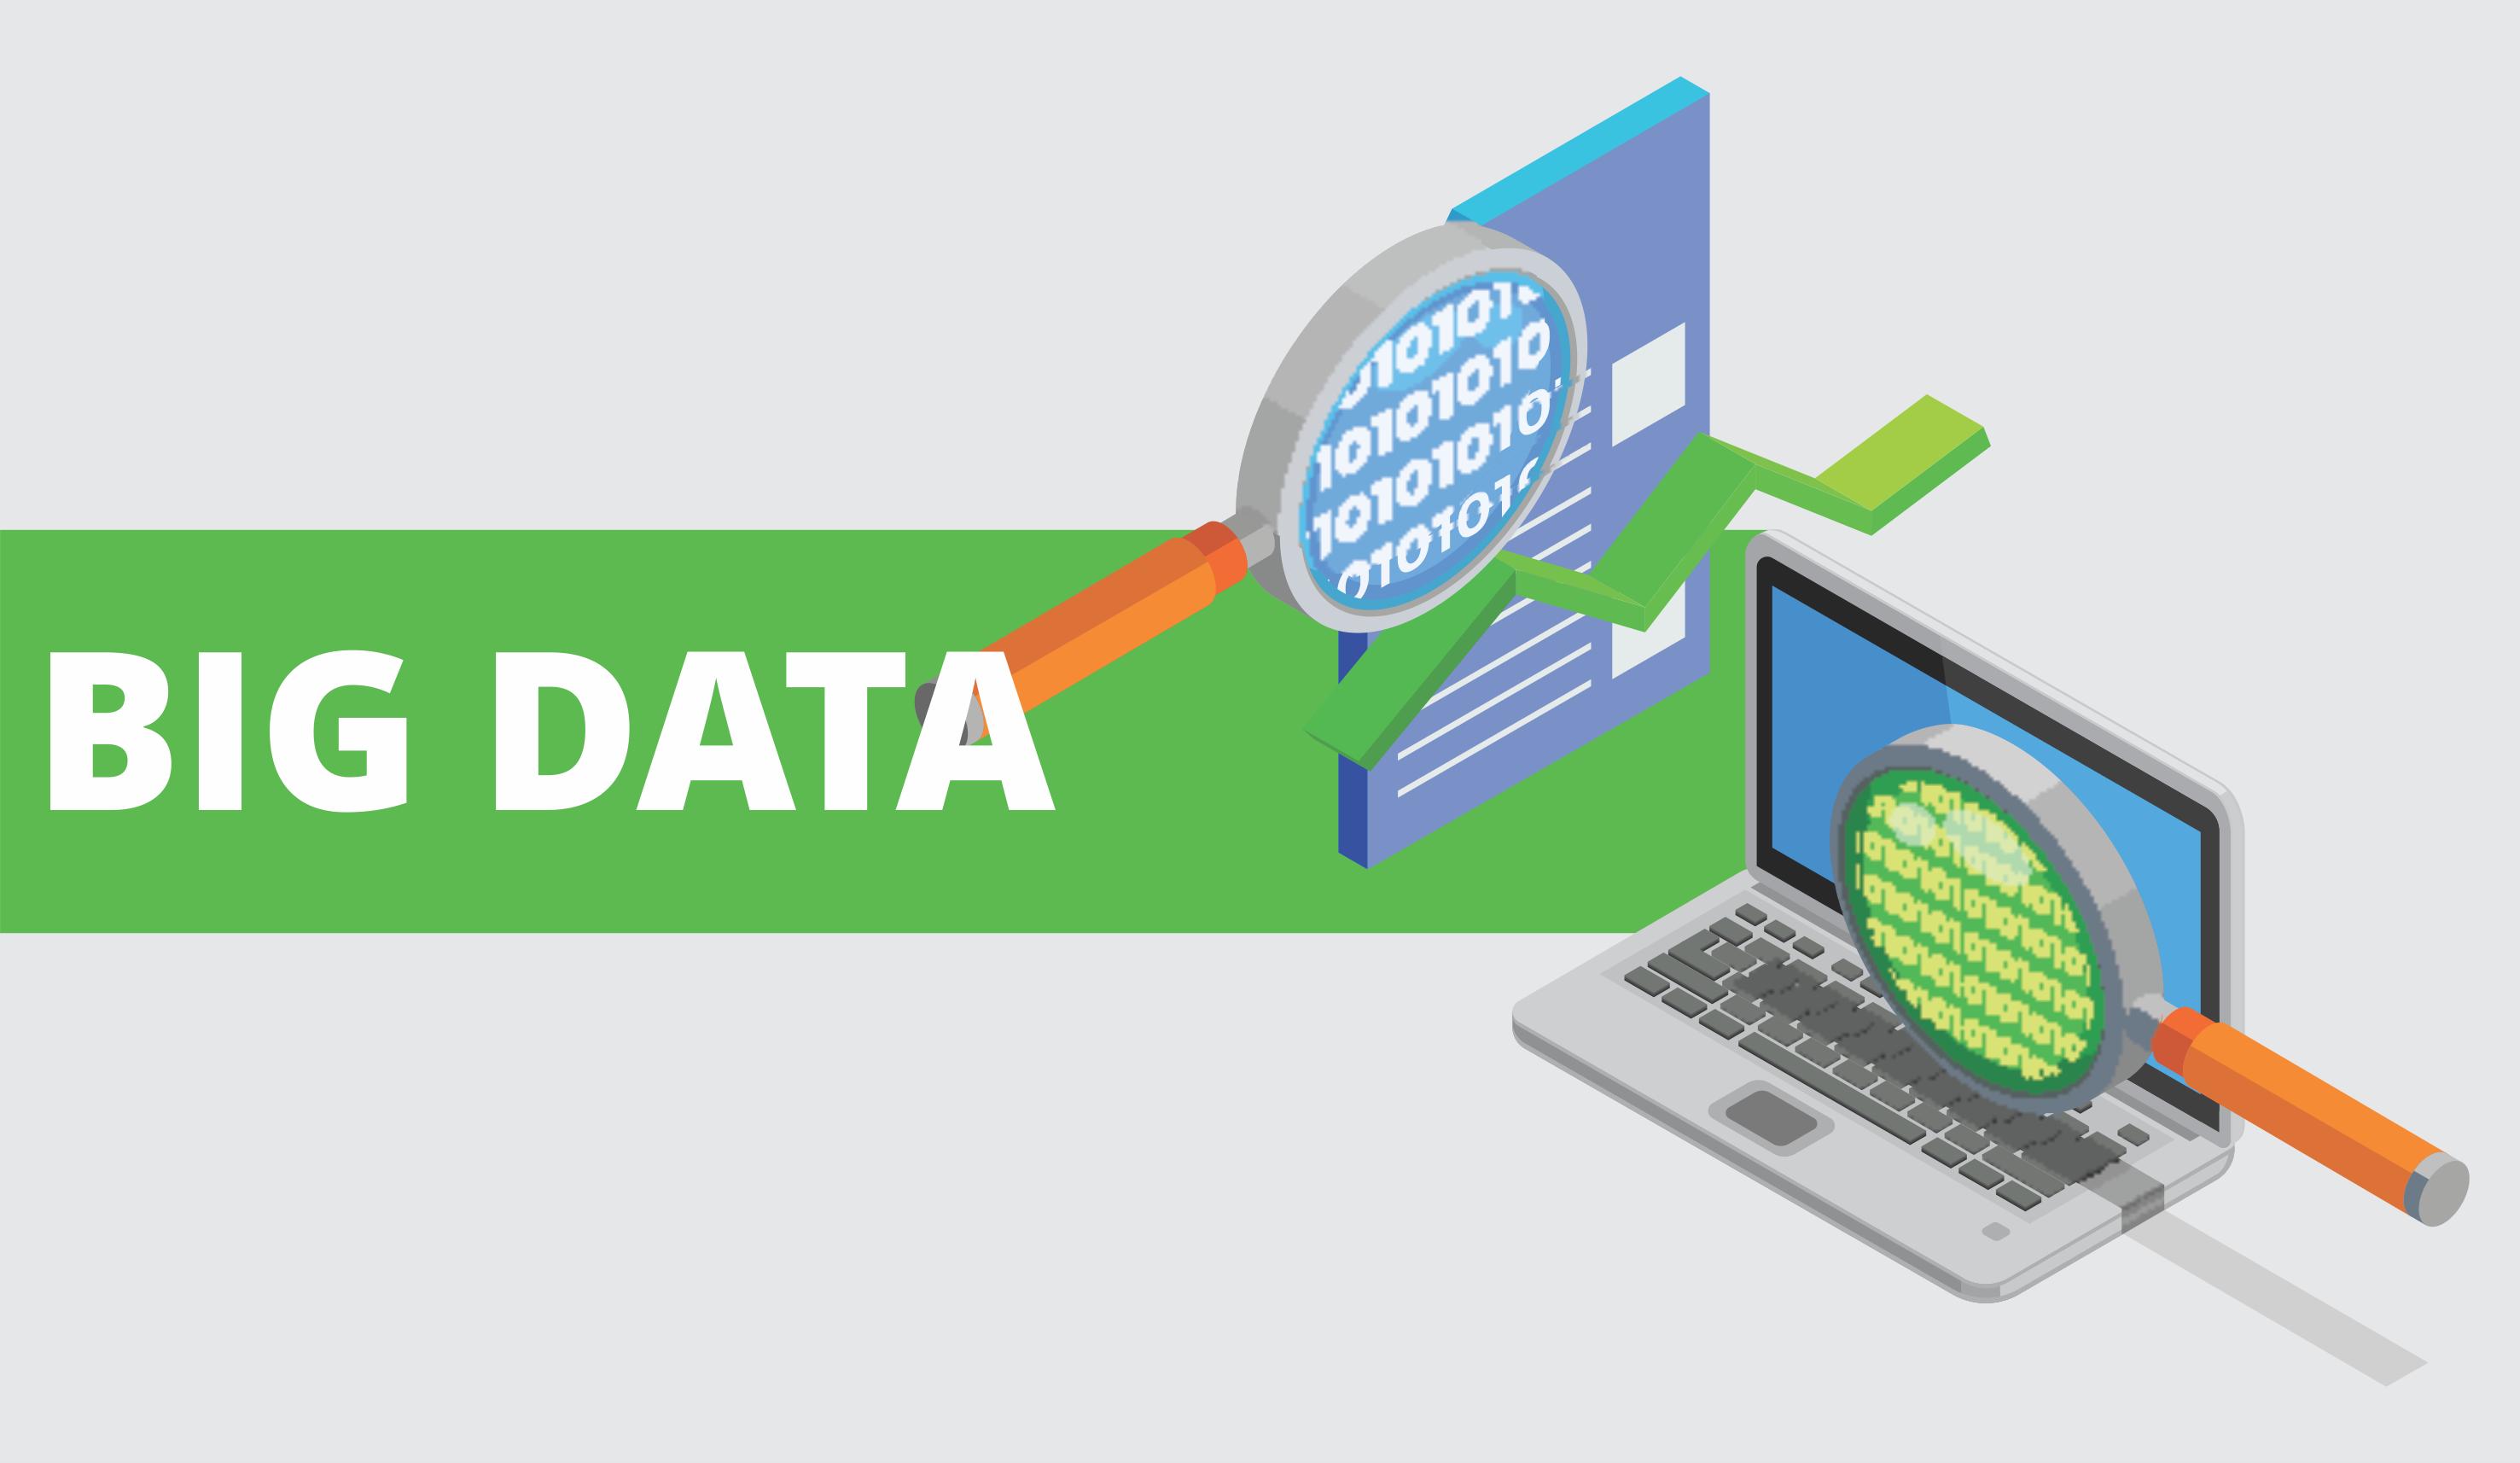 Ebook - Big data entenda como os dados podem aumentar os lucros